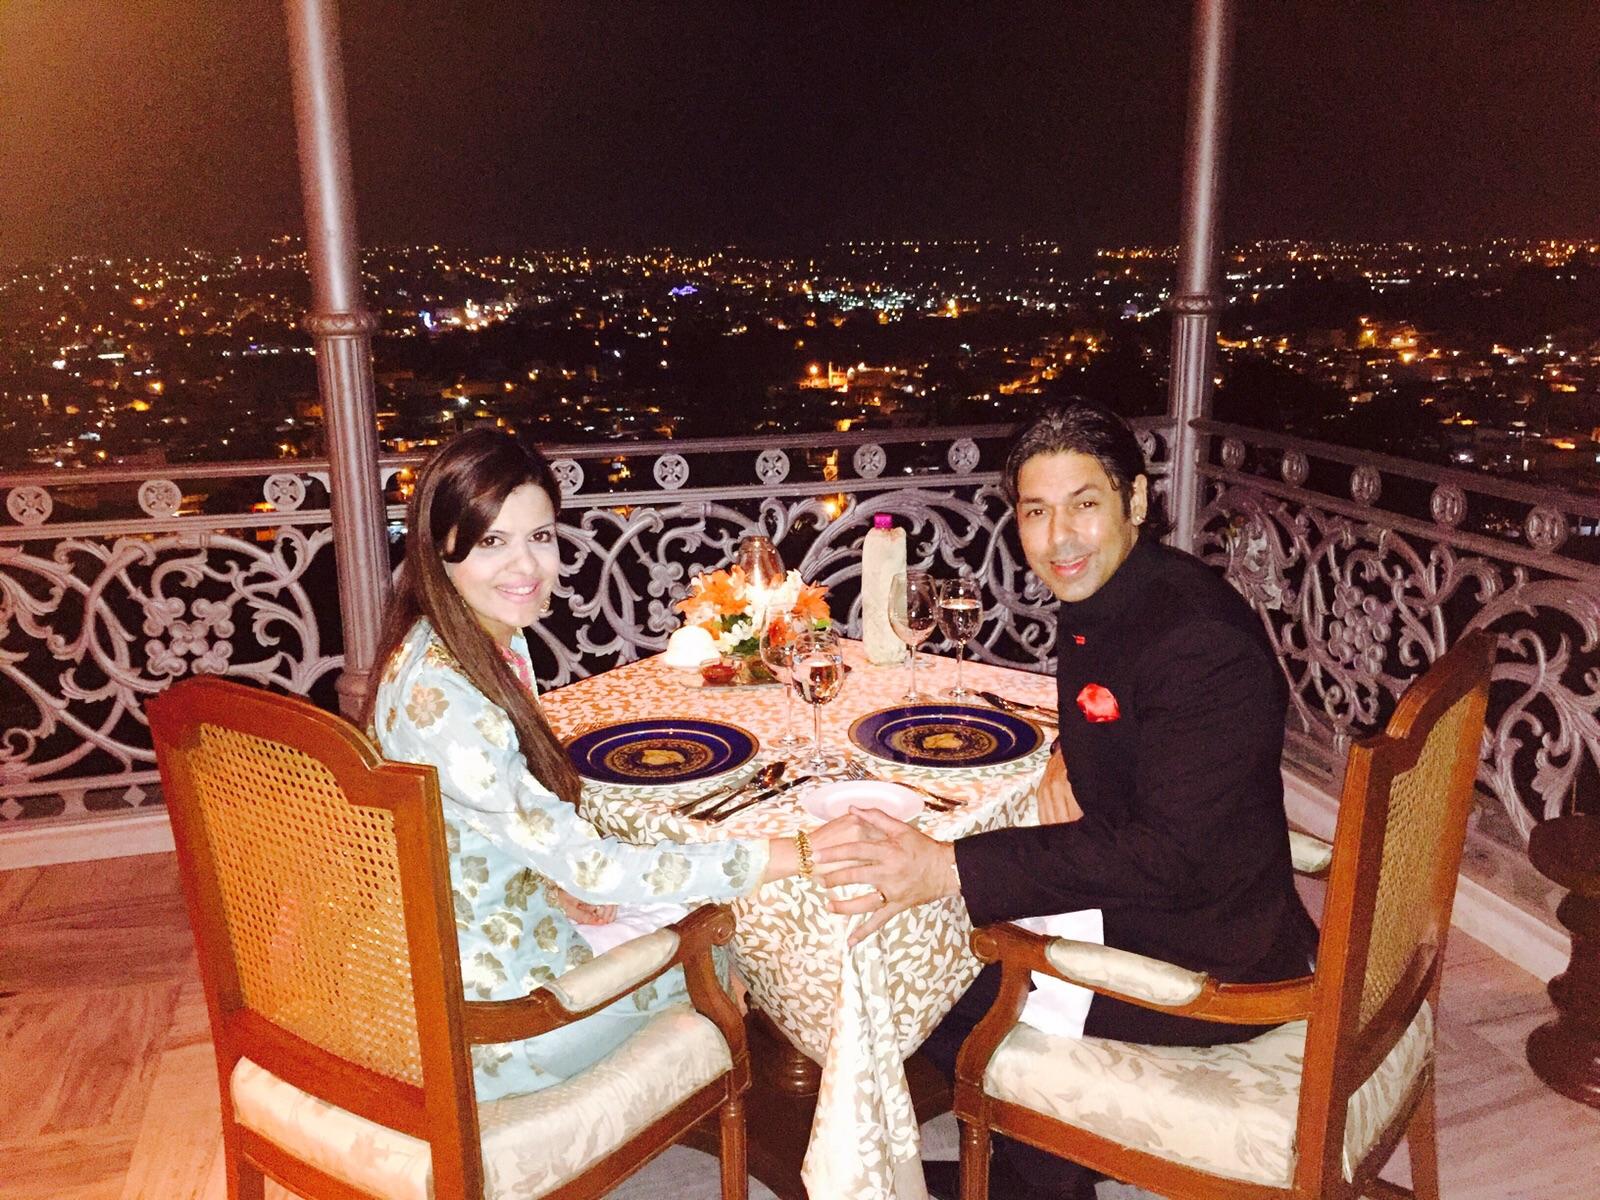 golb bungalow taj, luxury hotel Hyderabad, luxury palace hyderabad, Taj Falaknuma Palace Hyderabad, taj hotel hyderabad,